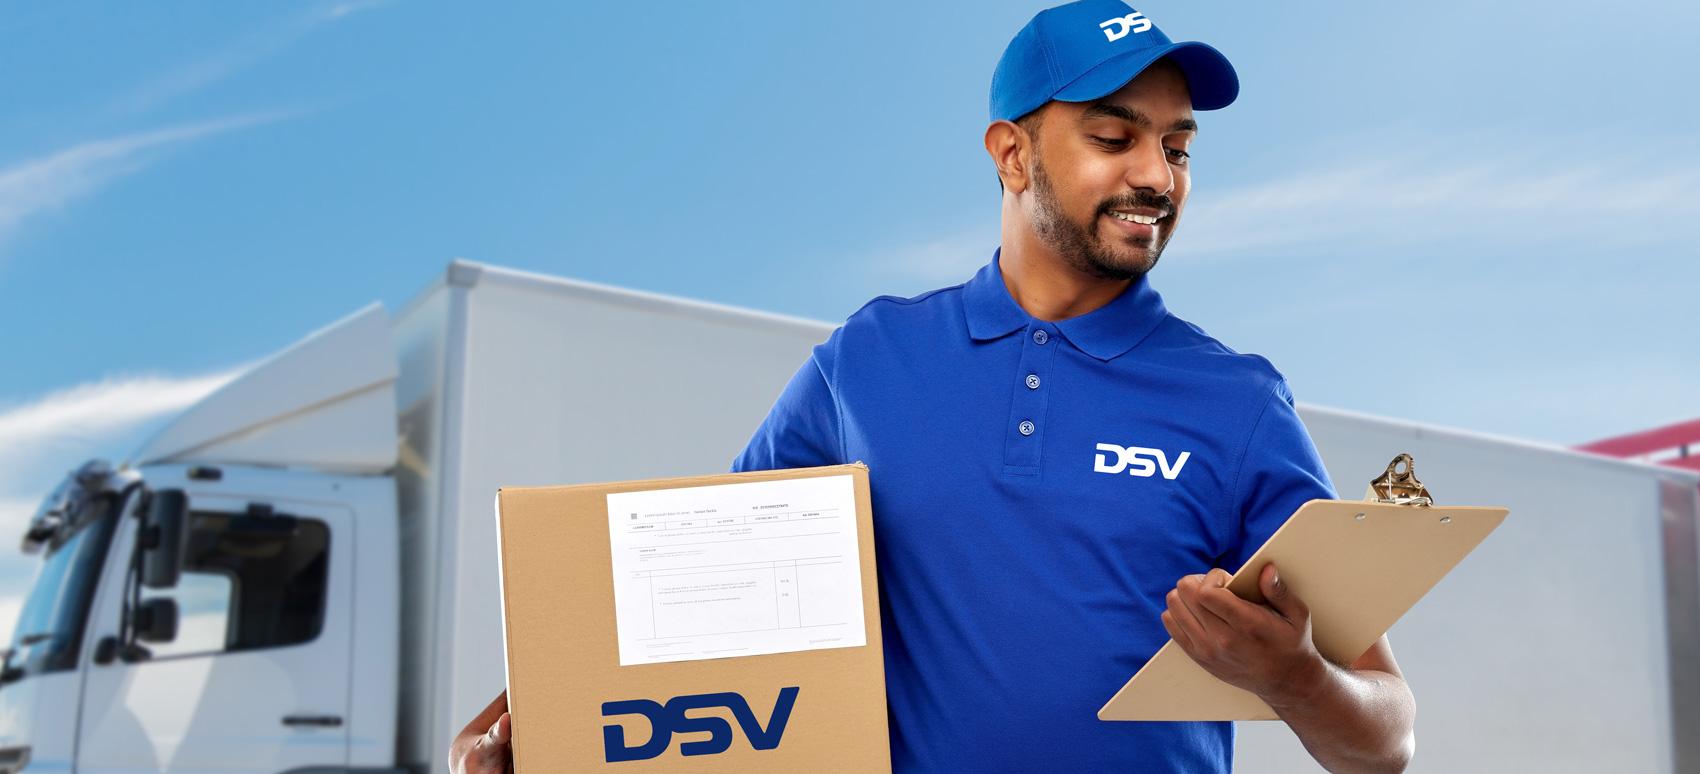 DSV Direct